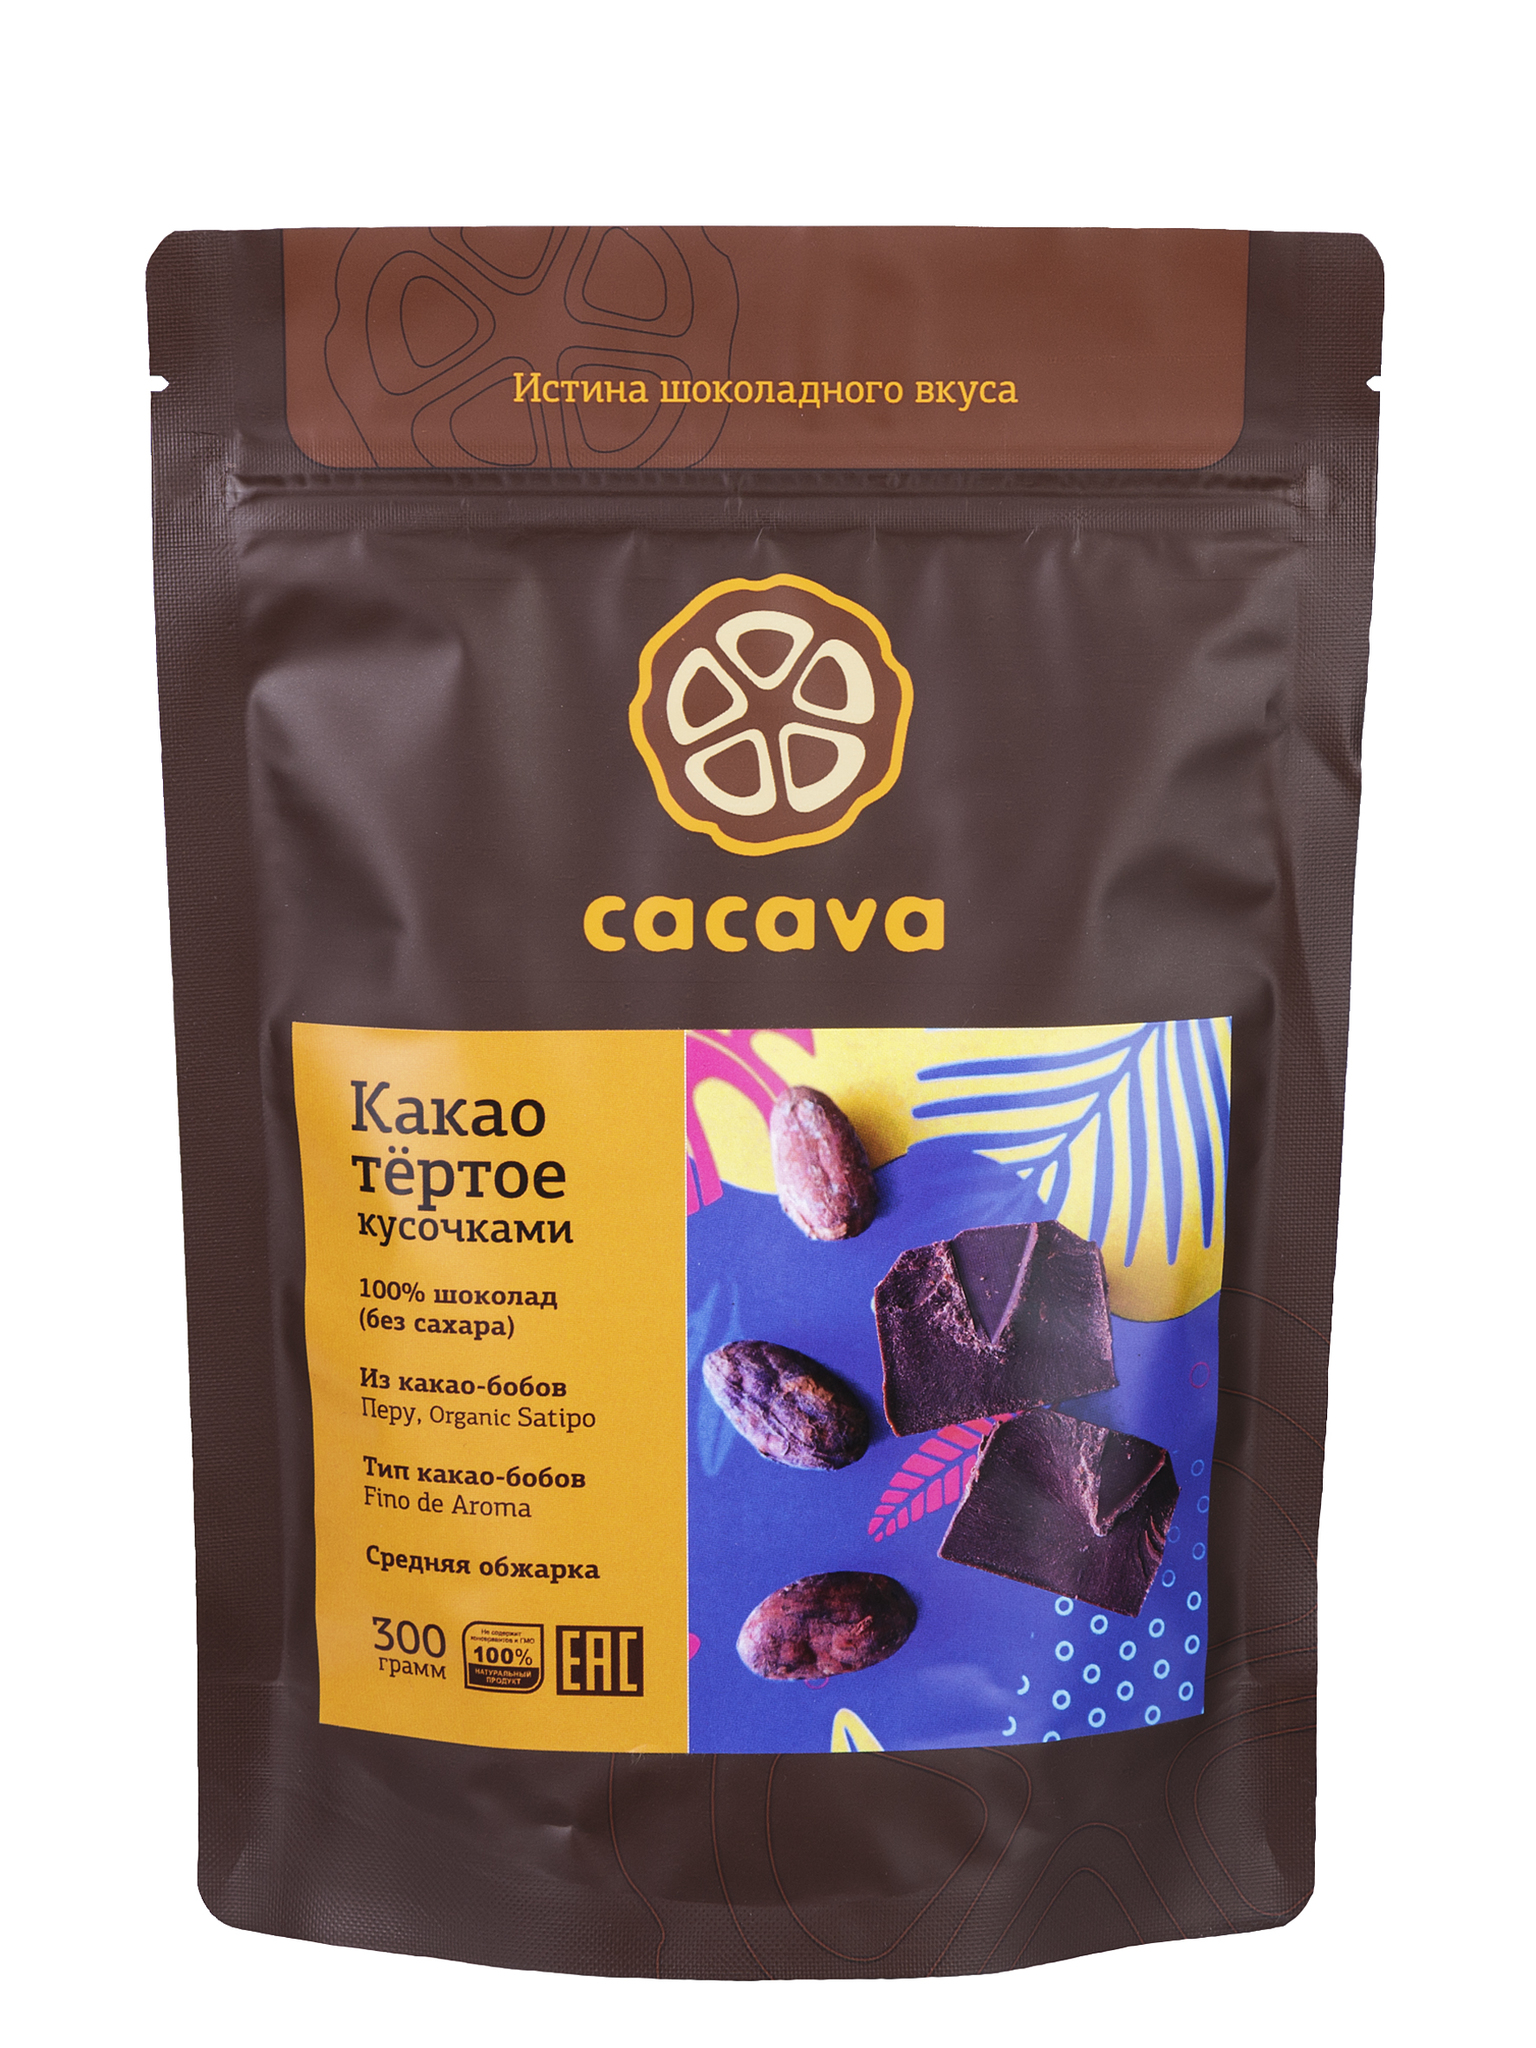 Какао тёртое кусочками (Перу, Organic Satipo), упаковка 300 грамм